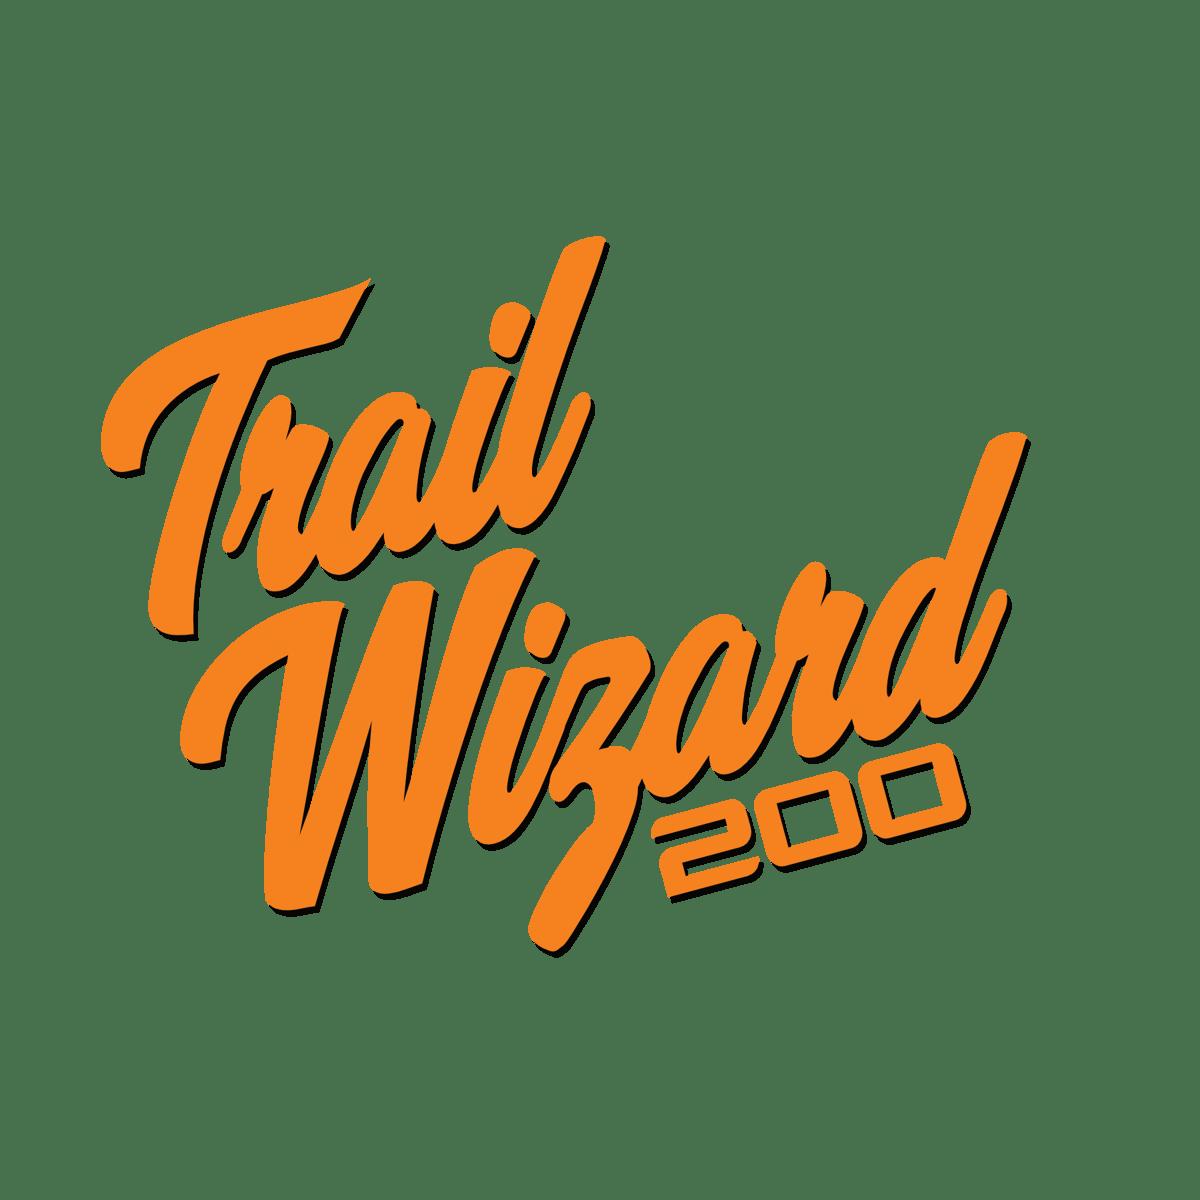 Trail Wizard 200 Cursive Black & Orange